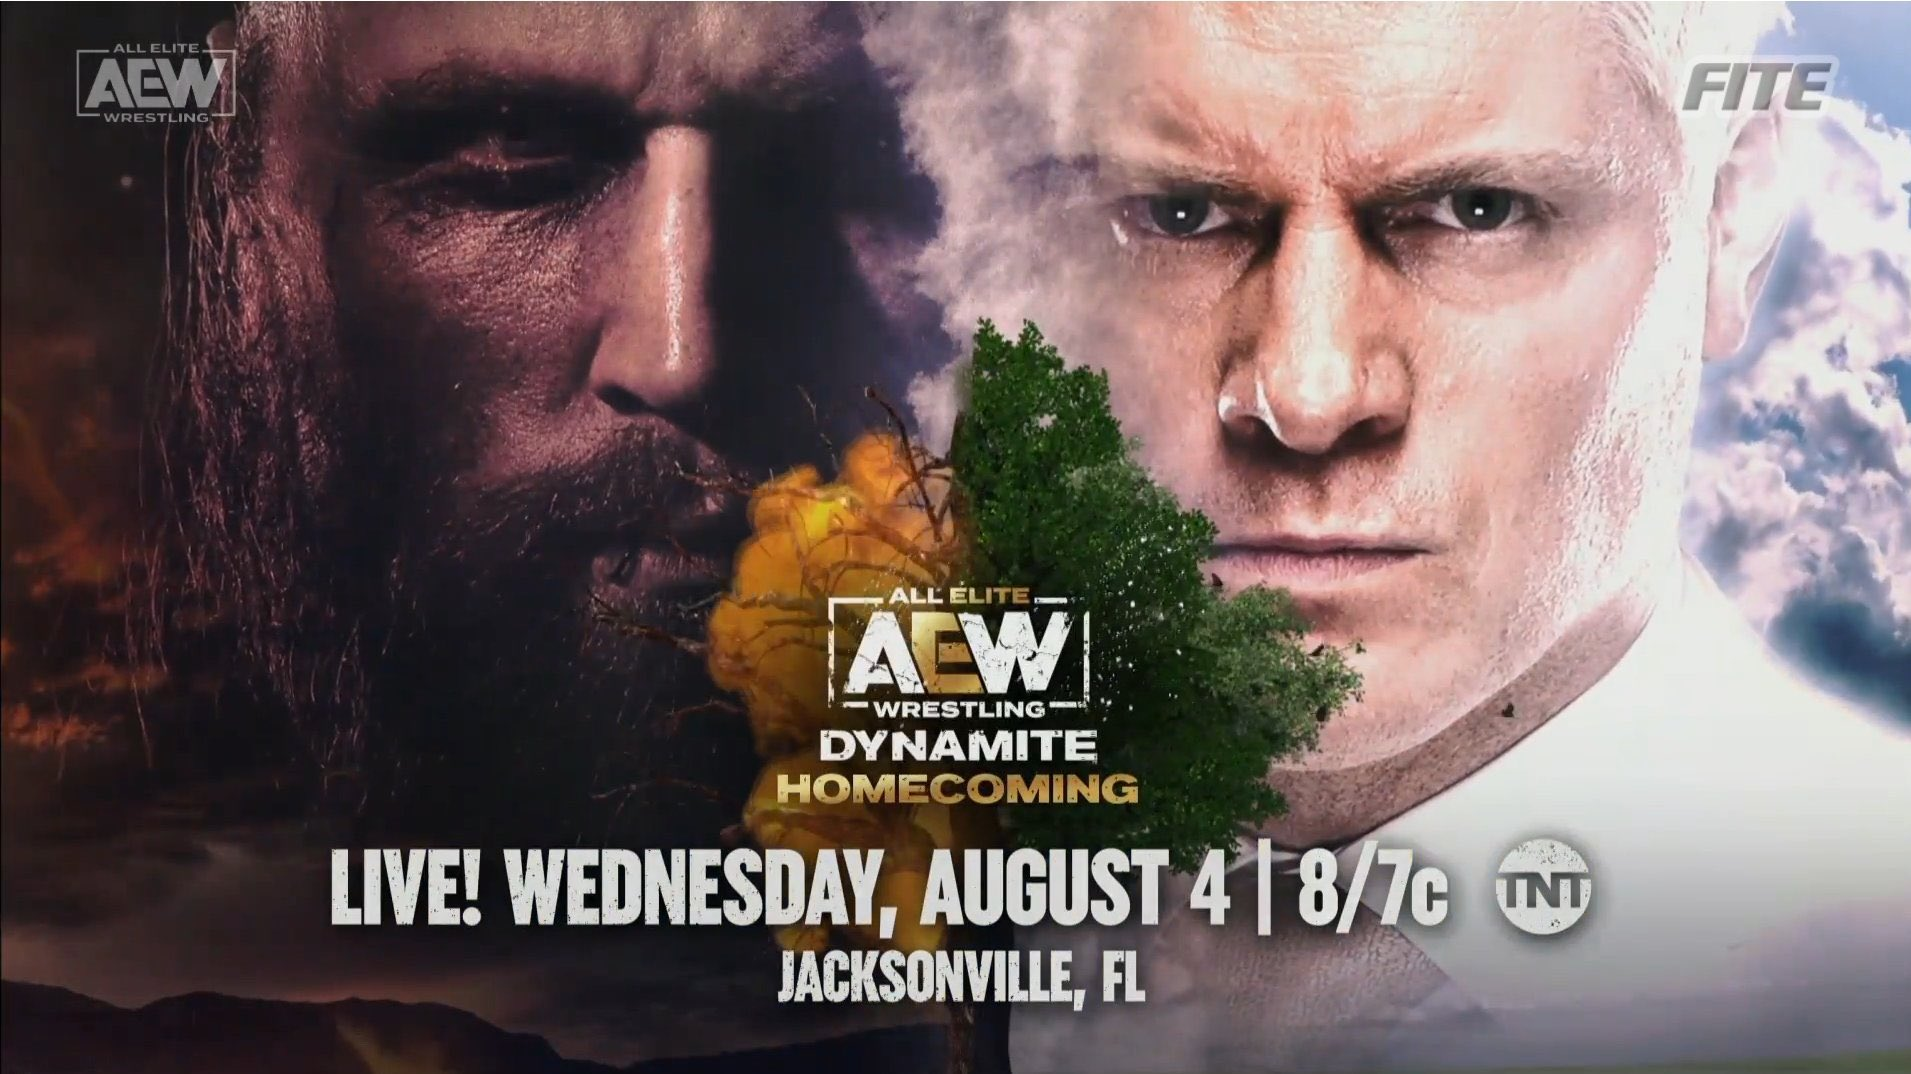 Malakai Black Vs Cody Rhodes Announced For AEW Dynamite: Homecoming